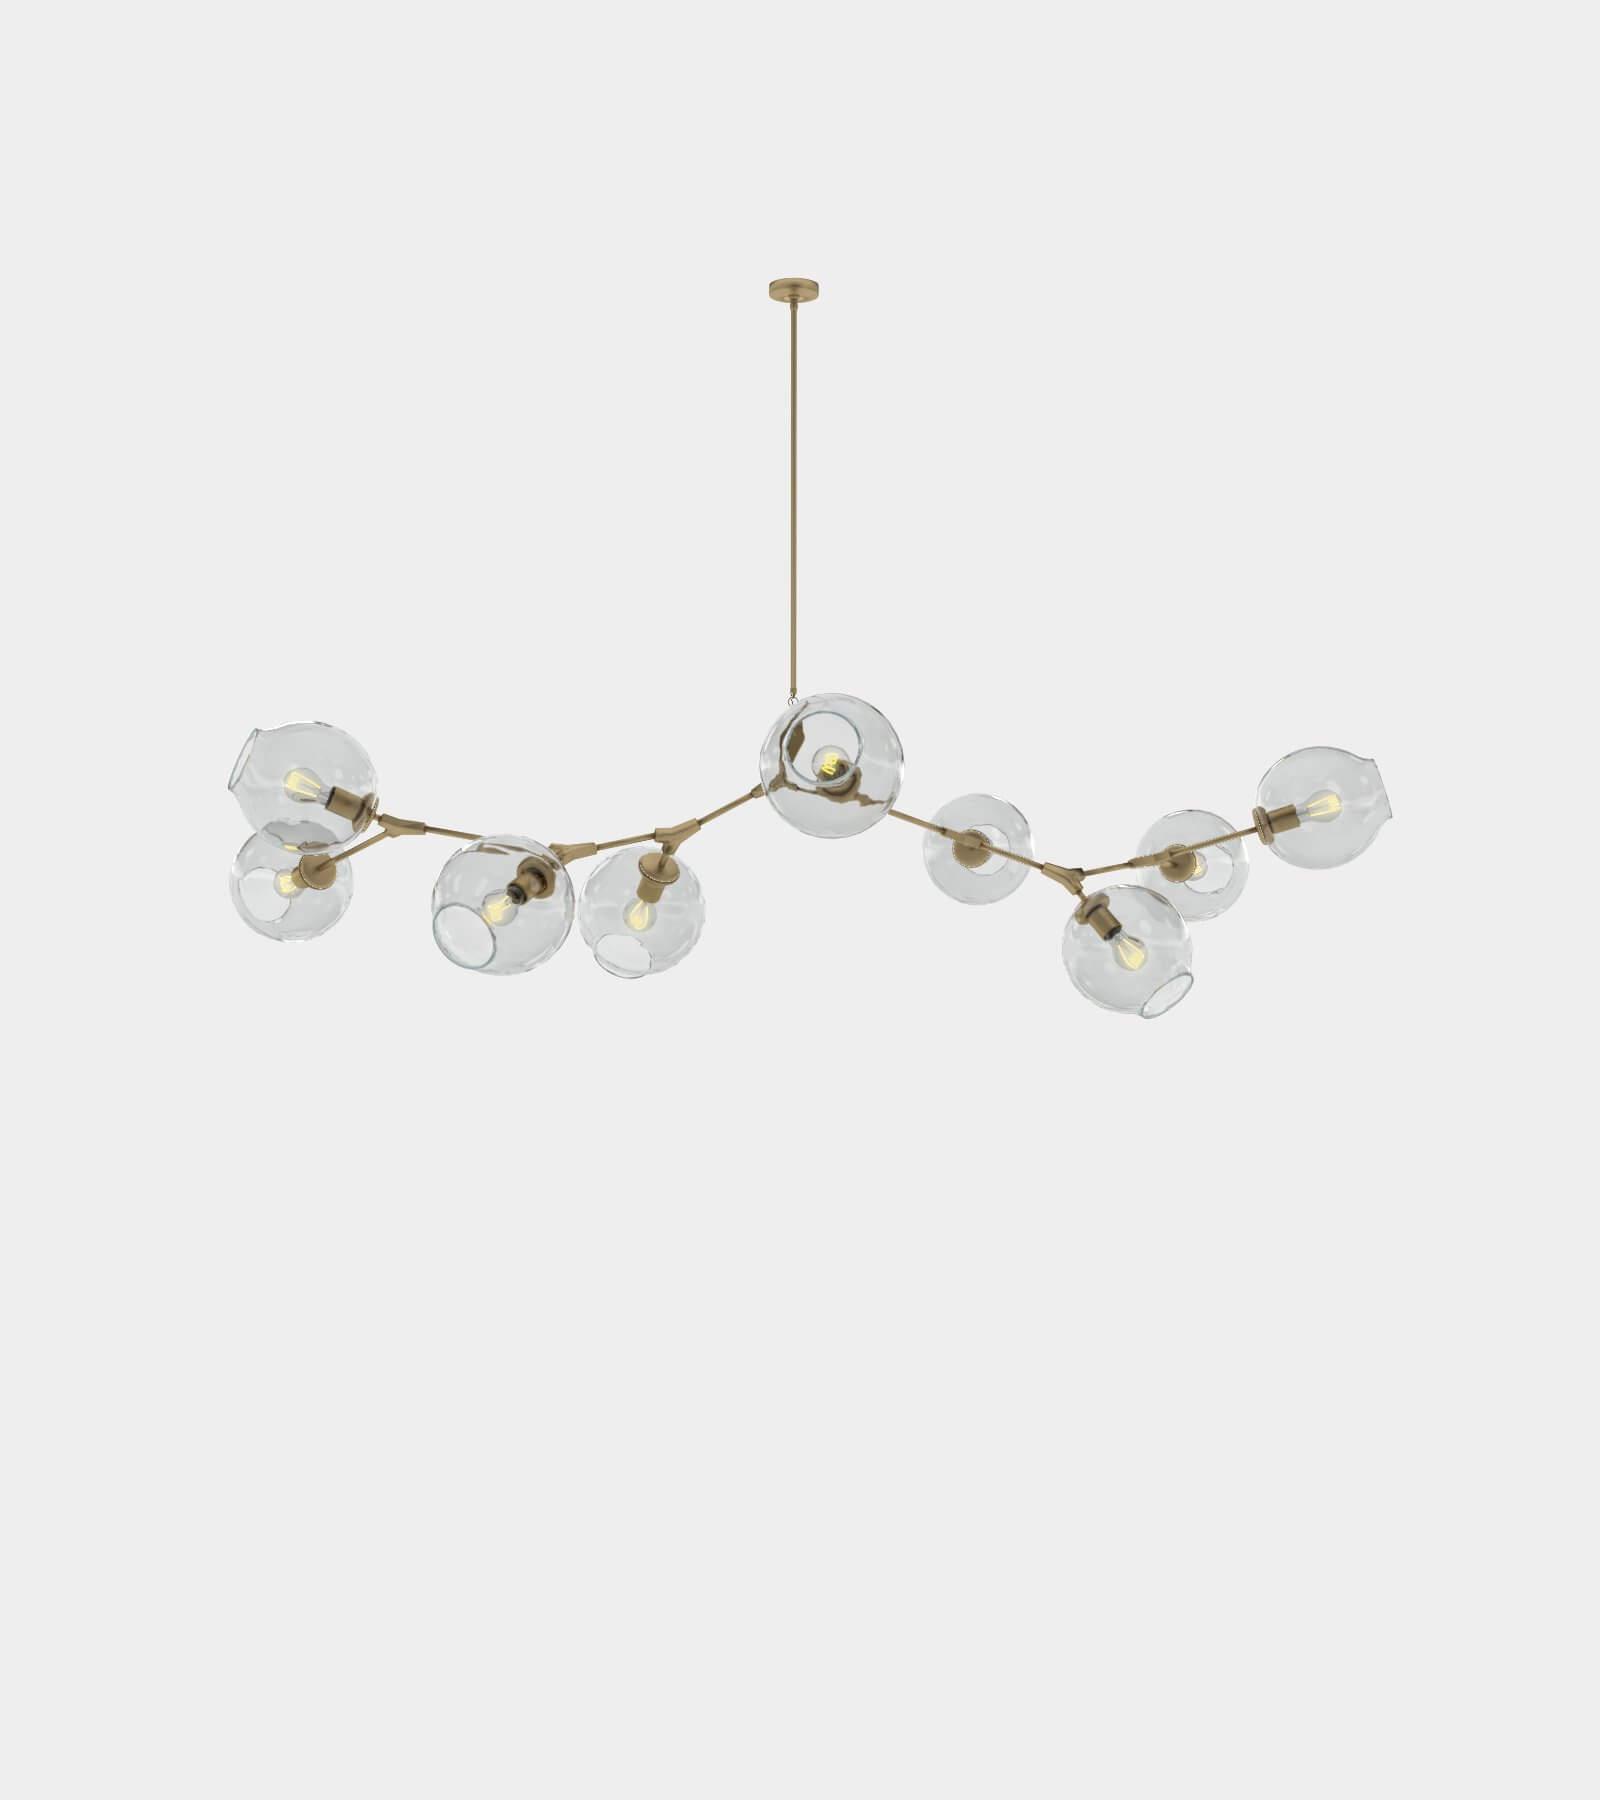 Branch pendant lamp 2 - 3D Model